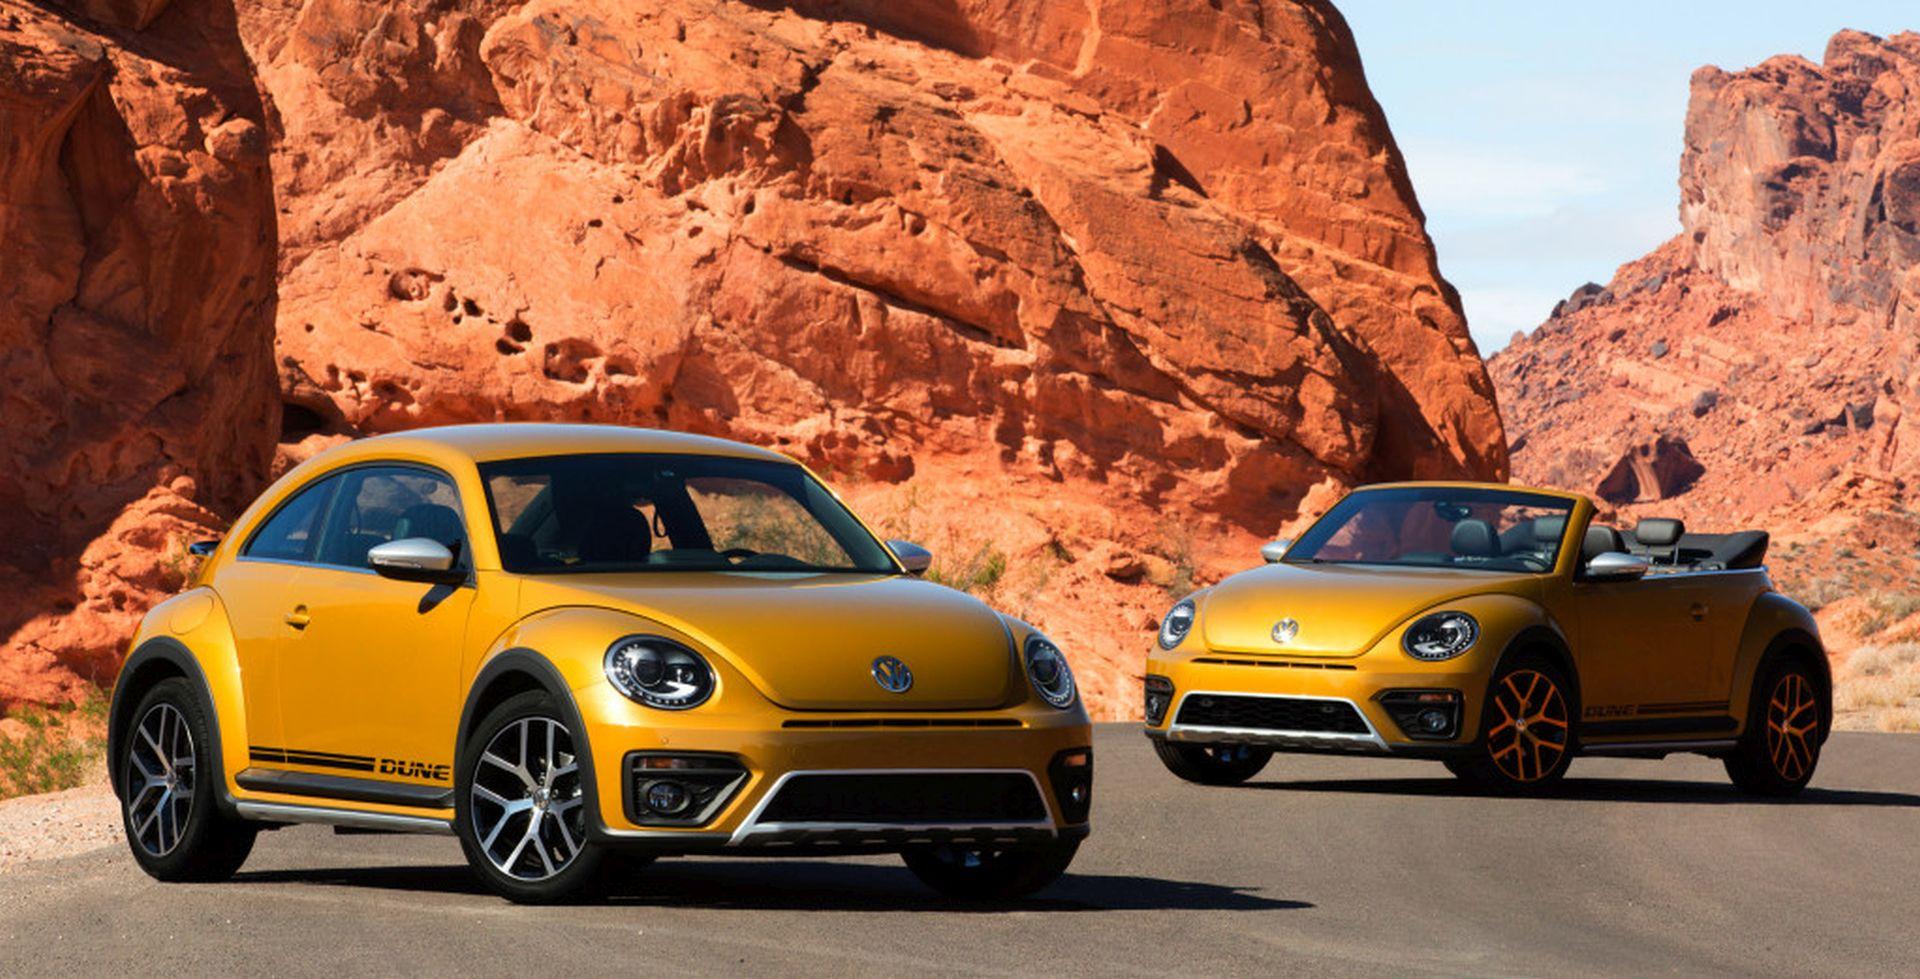 Volkswagen predstavio dvije nove Bube